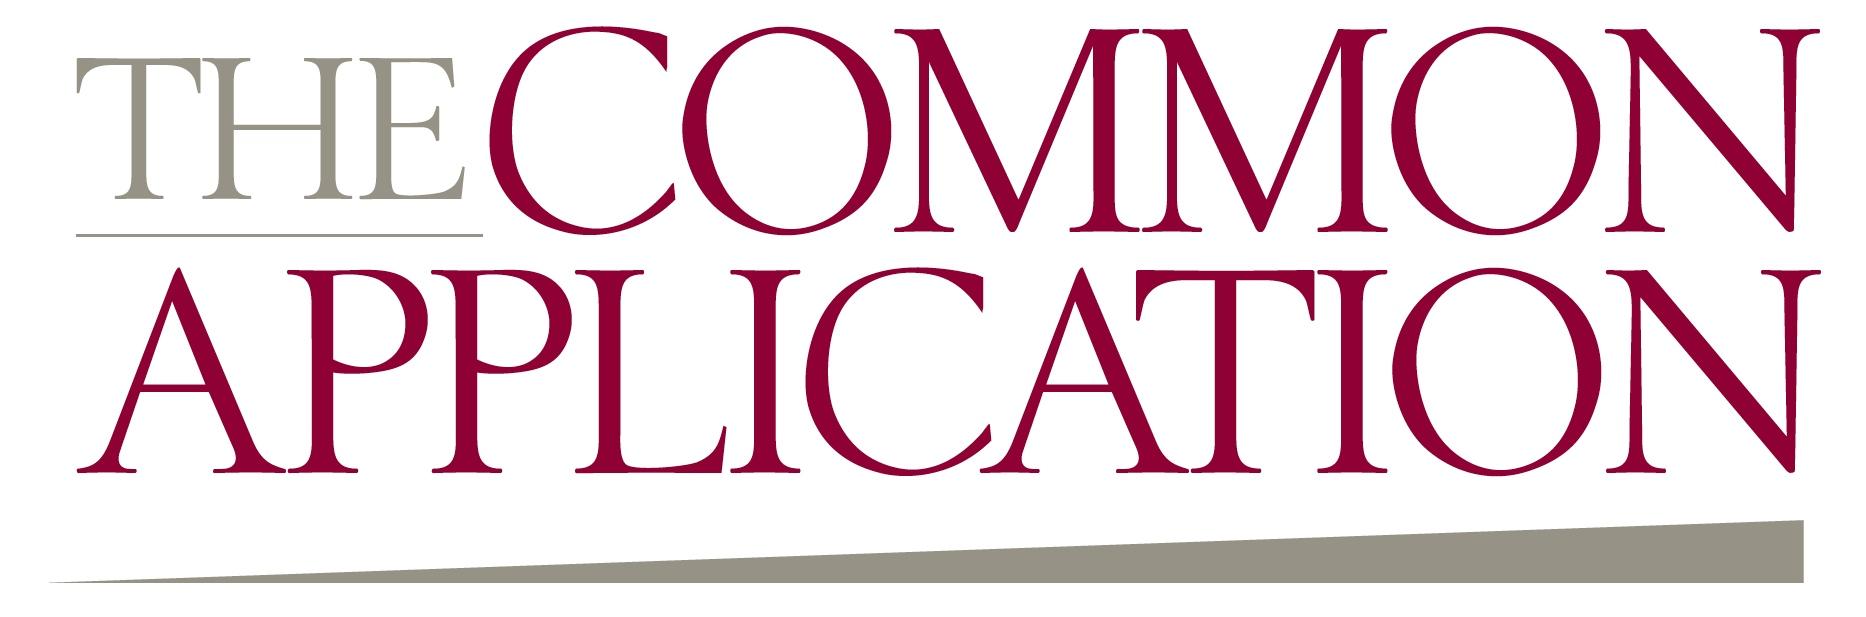 021 Common Application Logo Essay Example App Prompts Rare 2015-16 Full